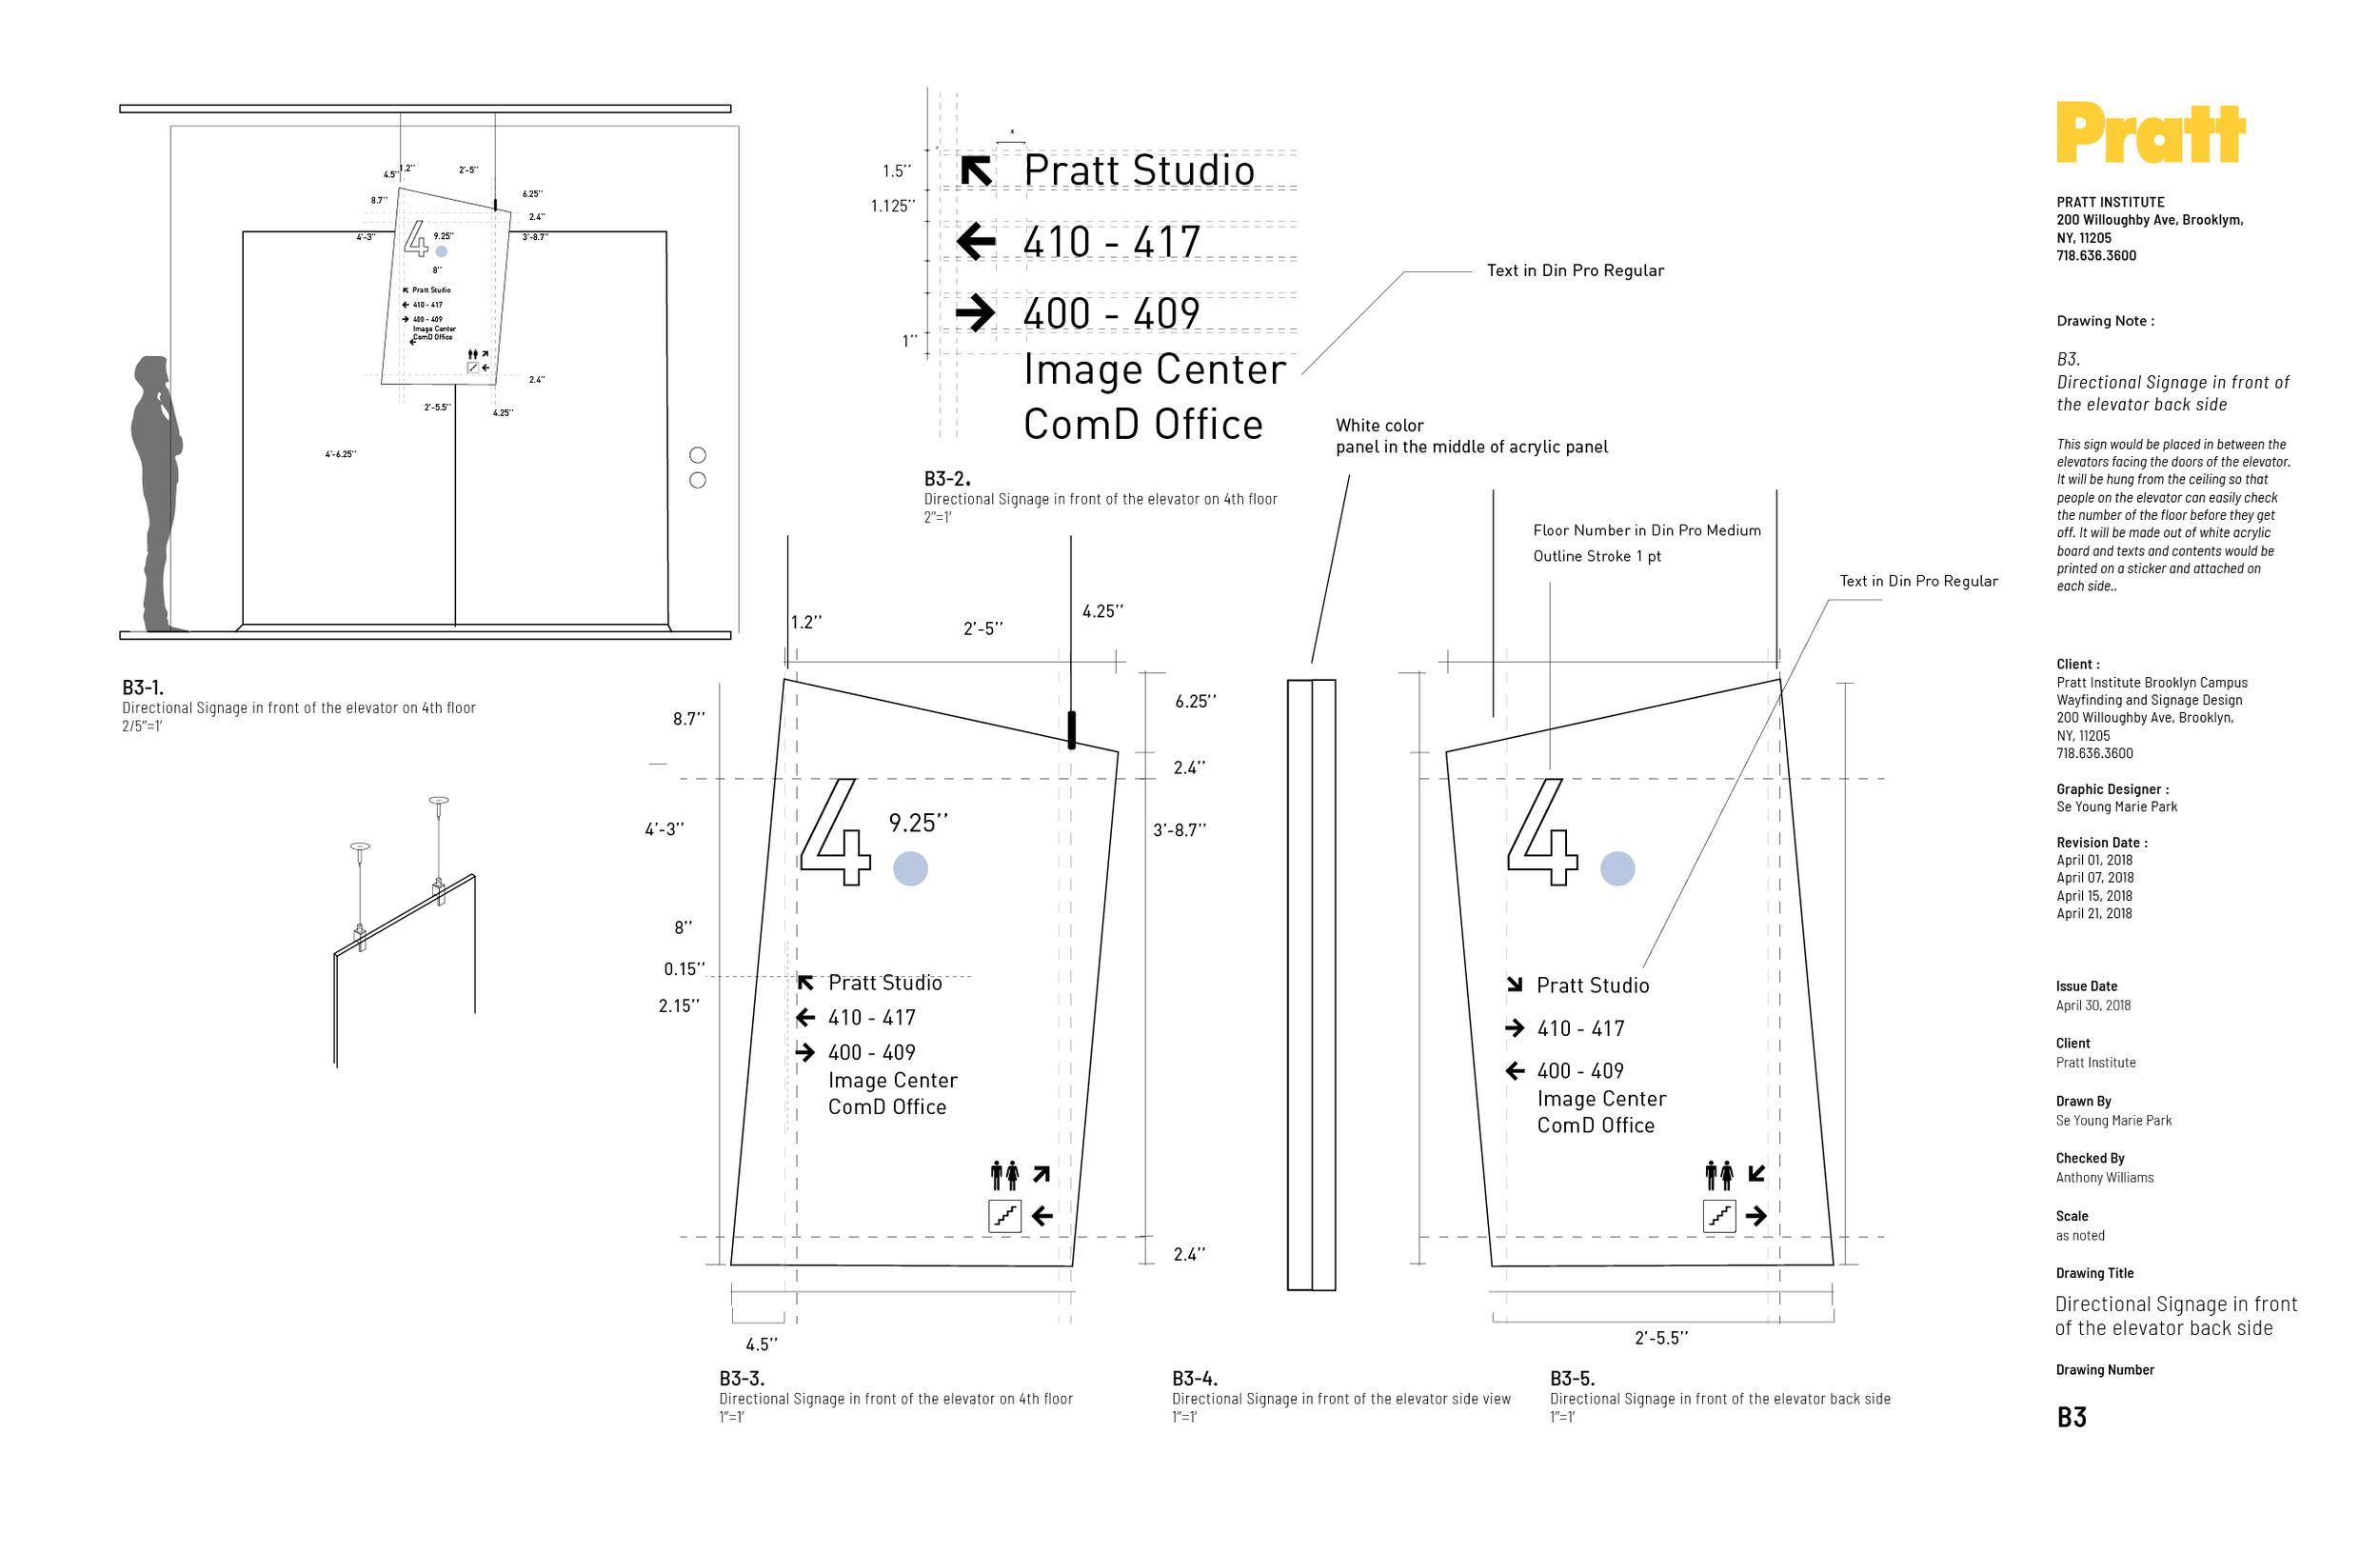 Pratt_Wayfinding_Signage_Design-11.png